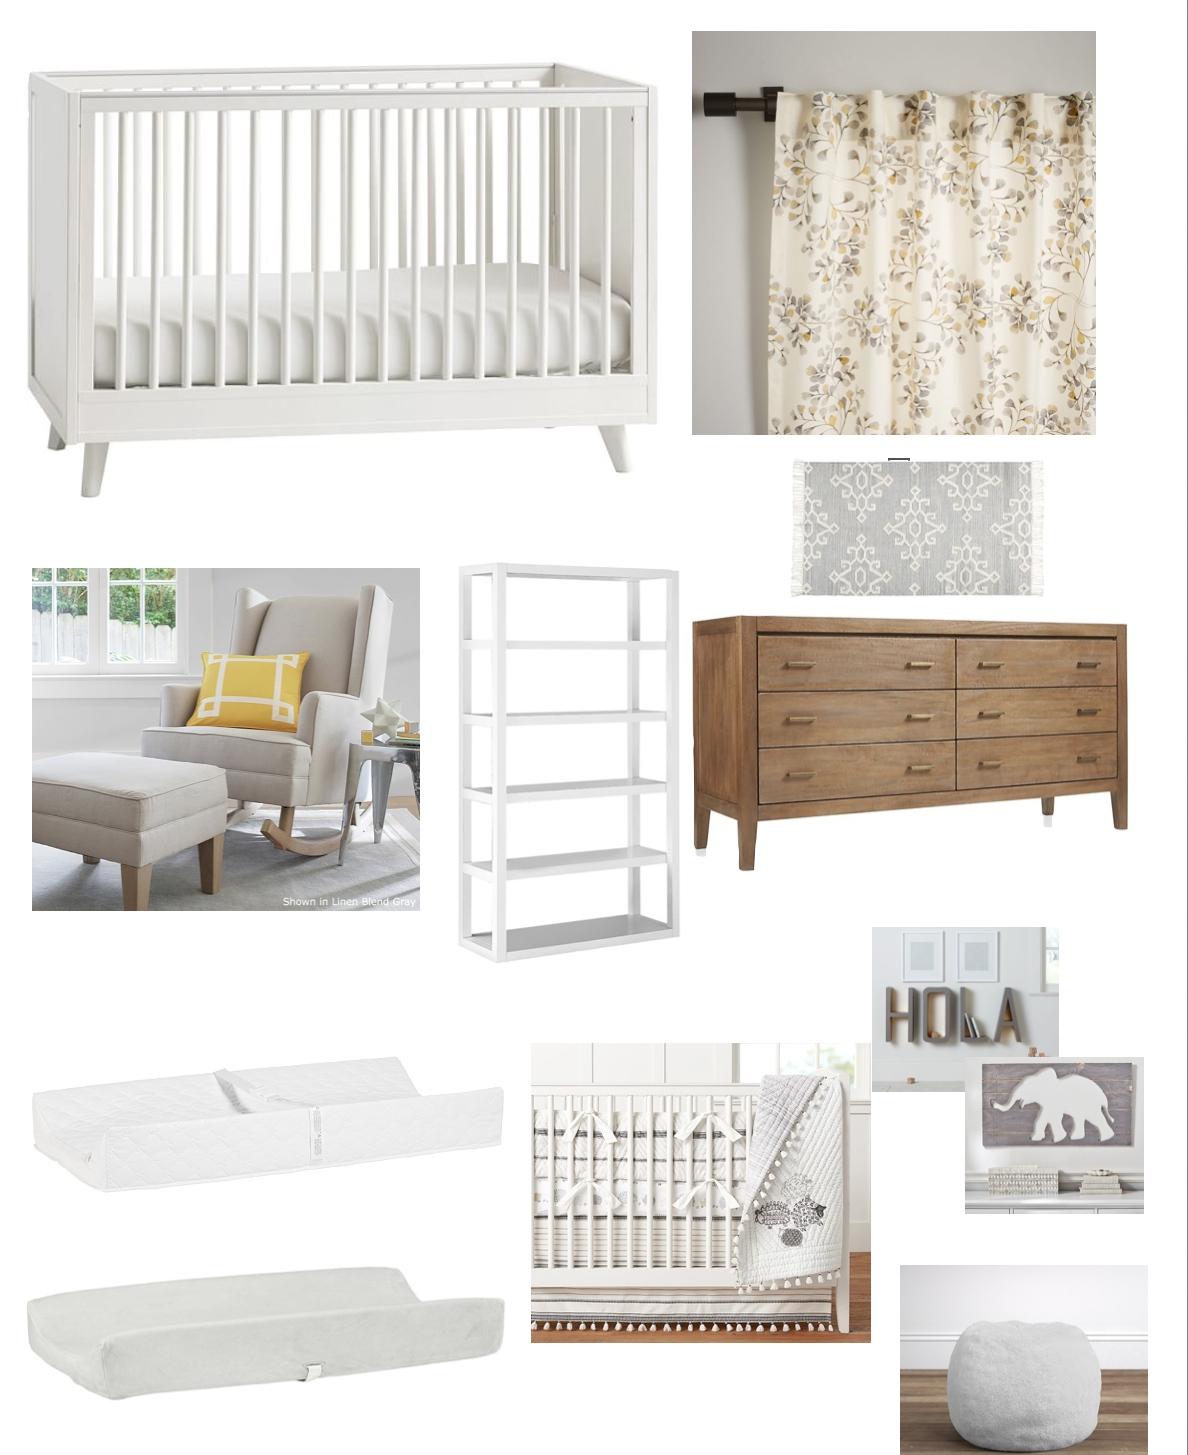 Chic Nursery Design Mood Board